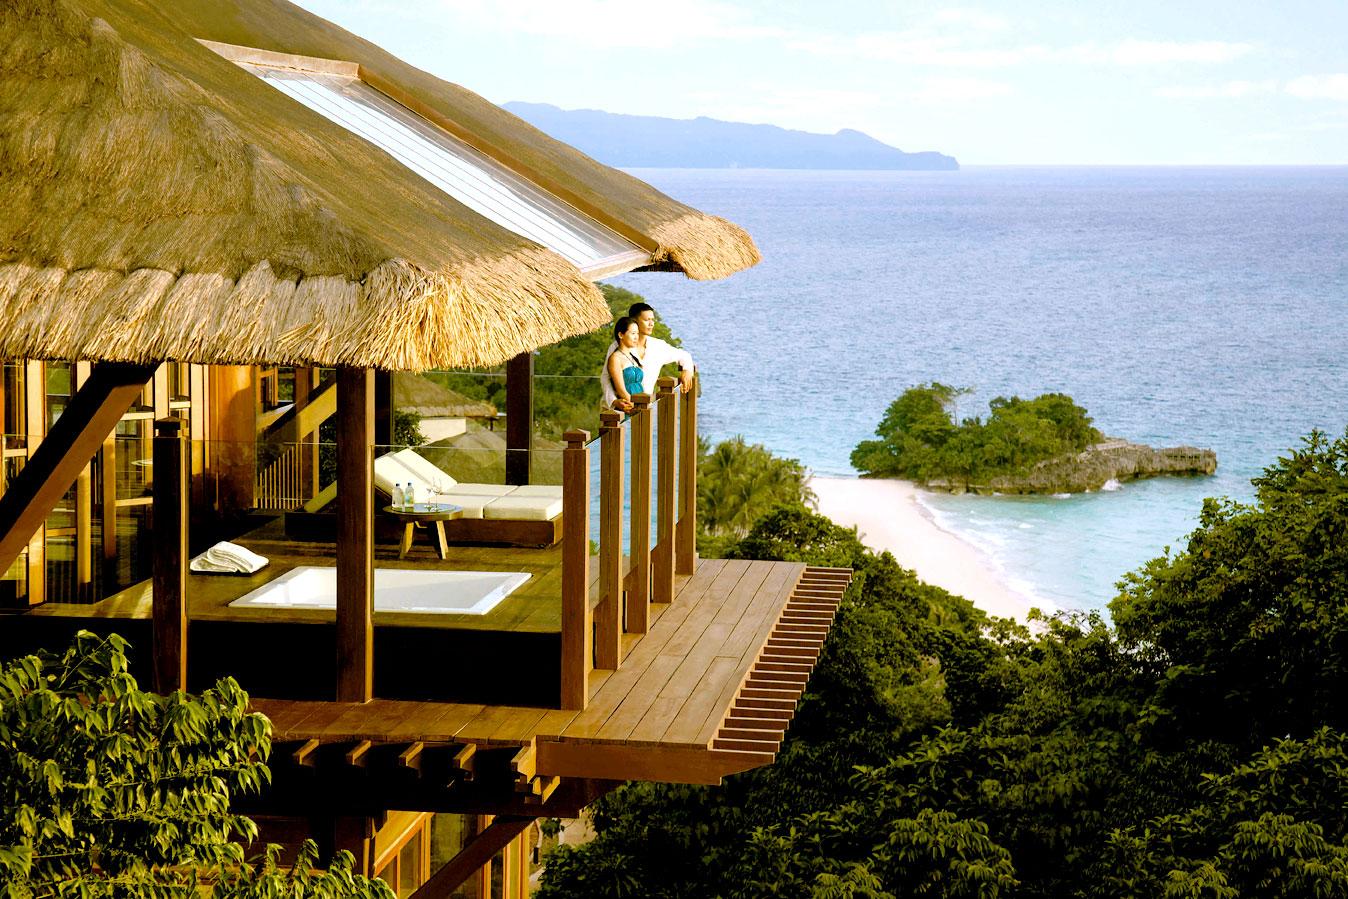 Citibank Promo: Luxurious Boracay getaway with Citi credit cards September - November 2013